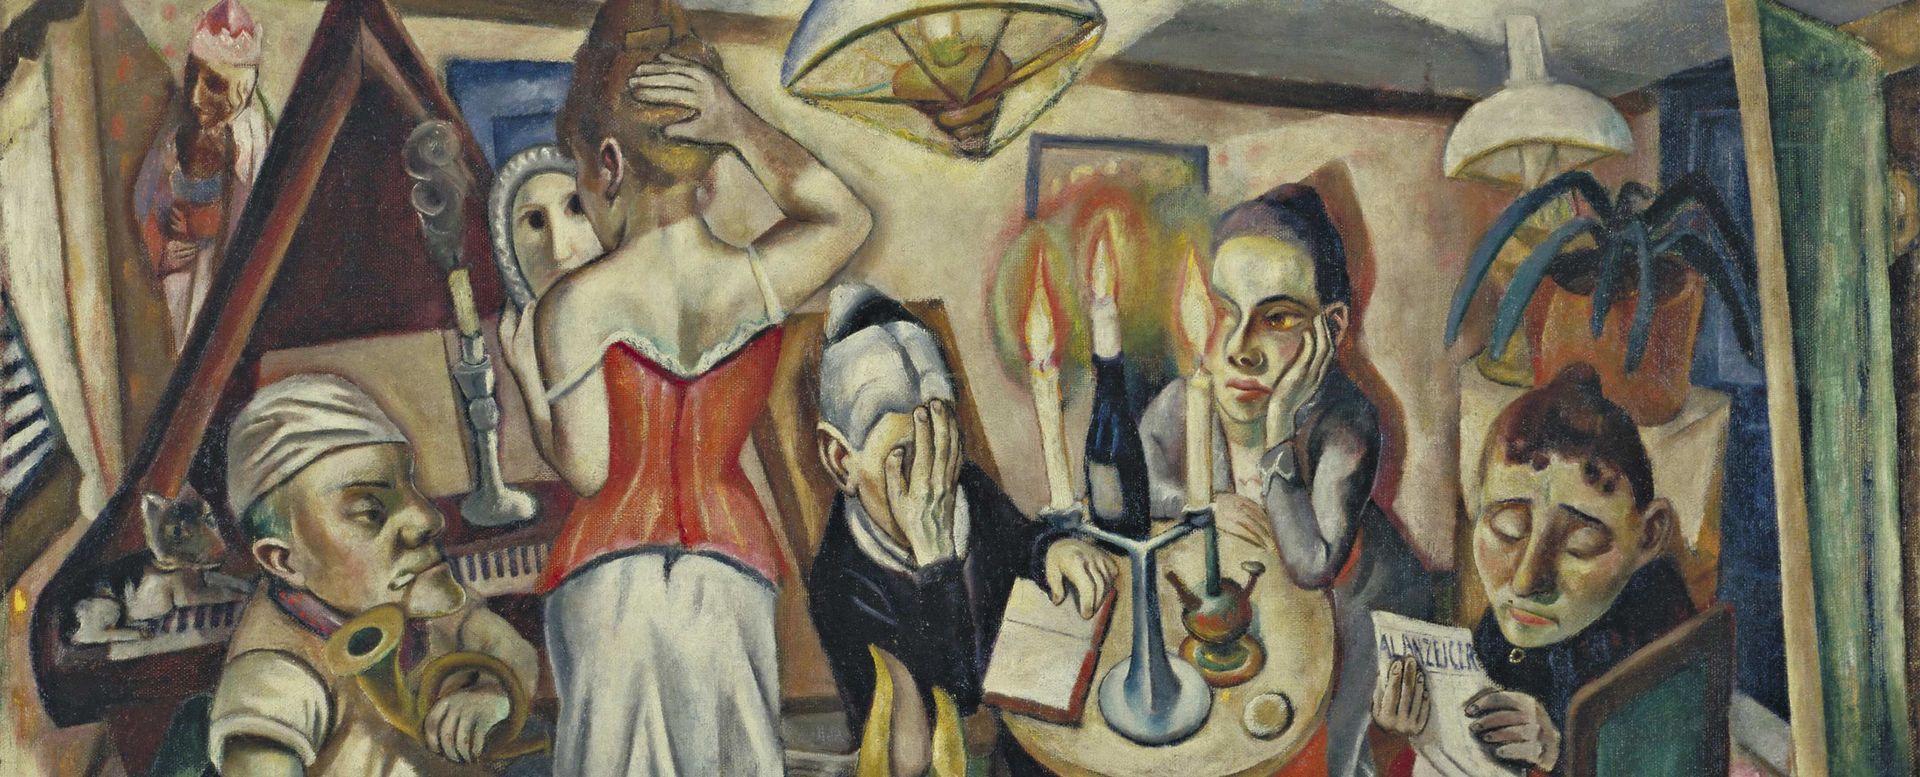 """It suits me just fine"": Max Beckmann in Manhattan | The Metropolitan  Museum of Art"